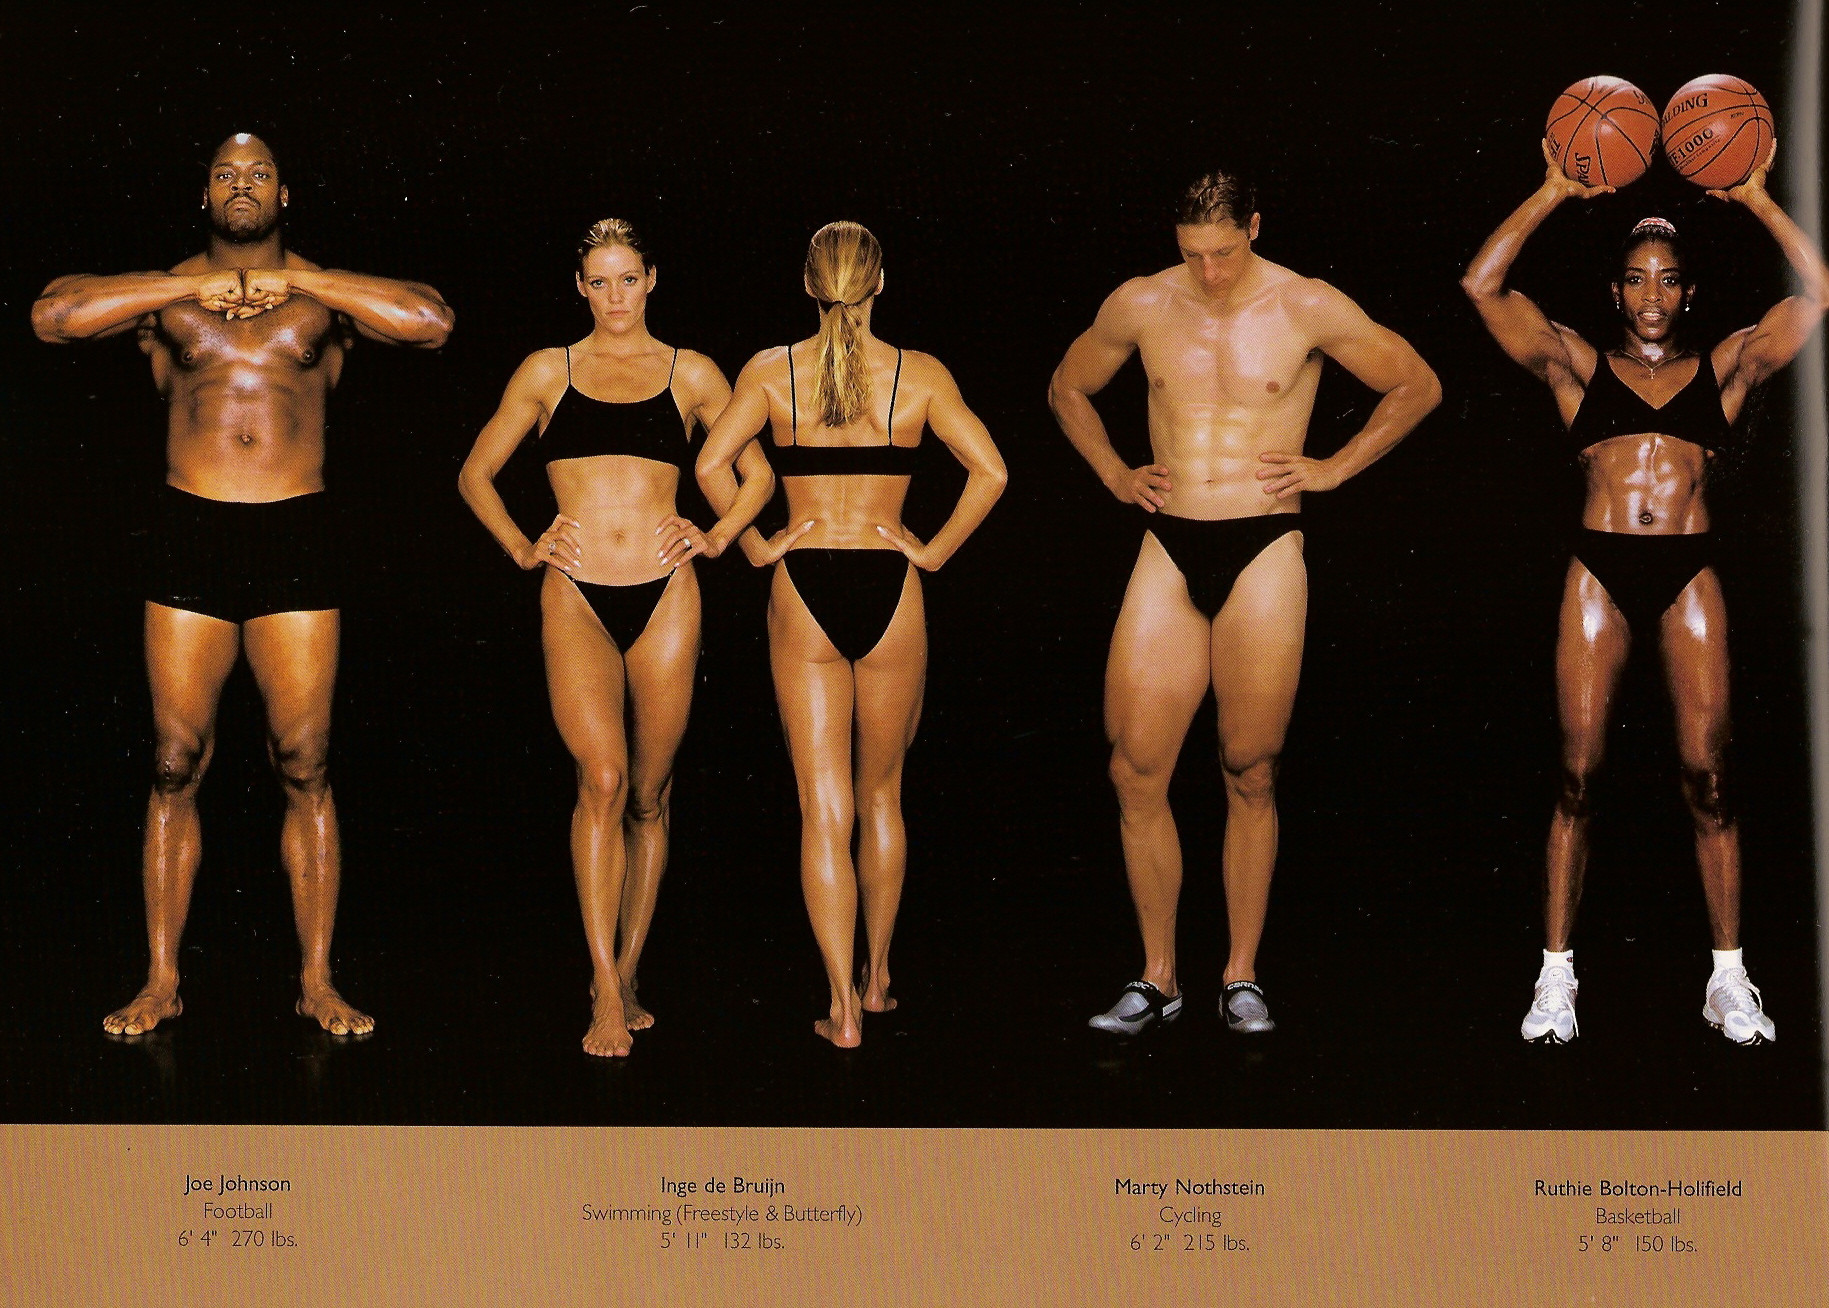 Howard Schatz / слева направо: американский футбол, плавание (фристайл и баттерфляй), велогонки, баскетбол.